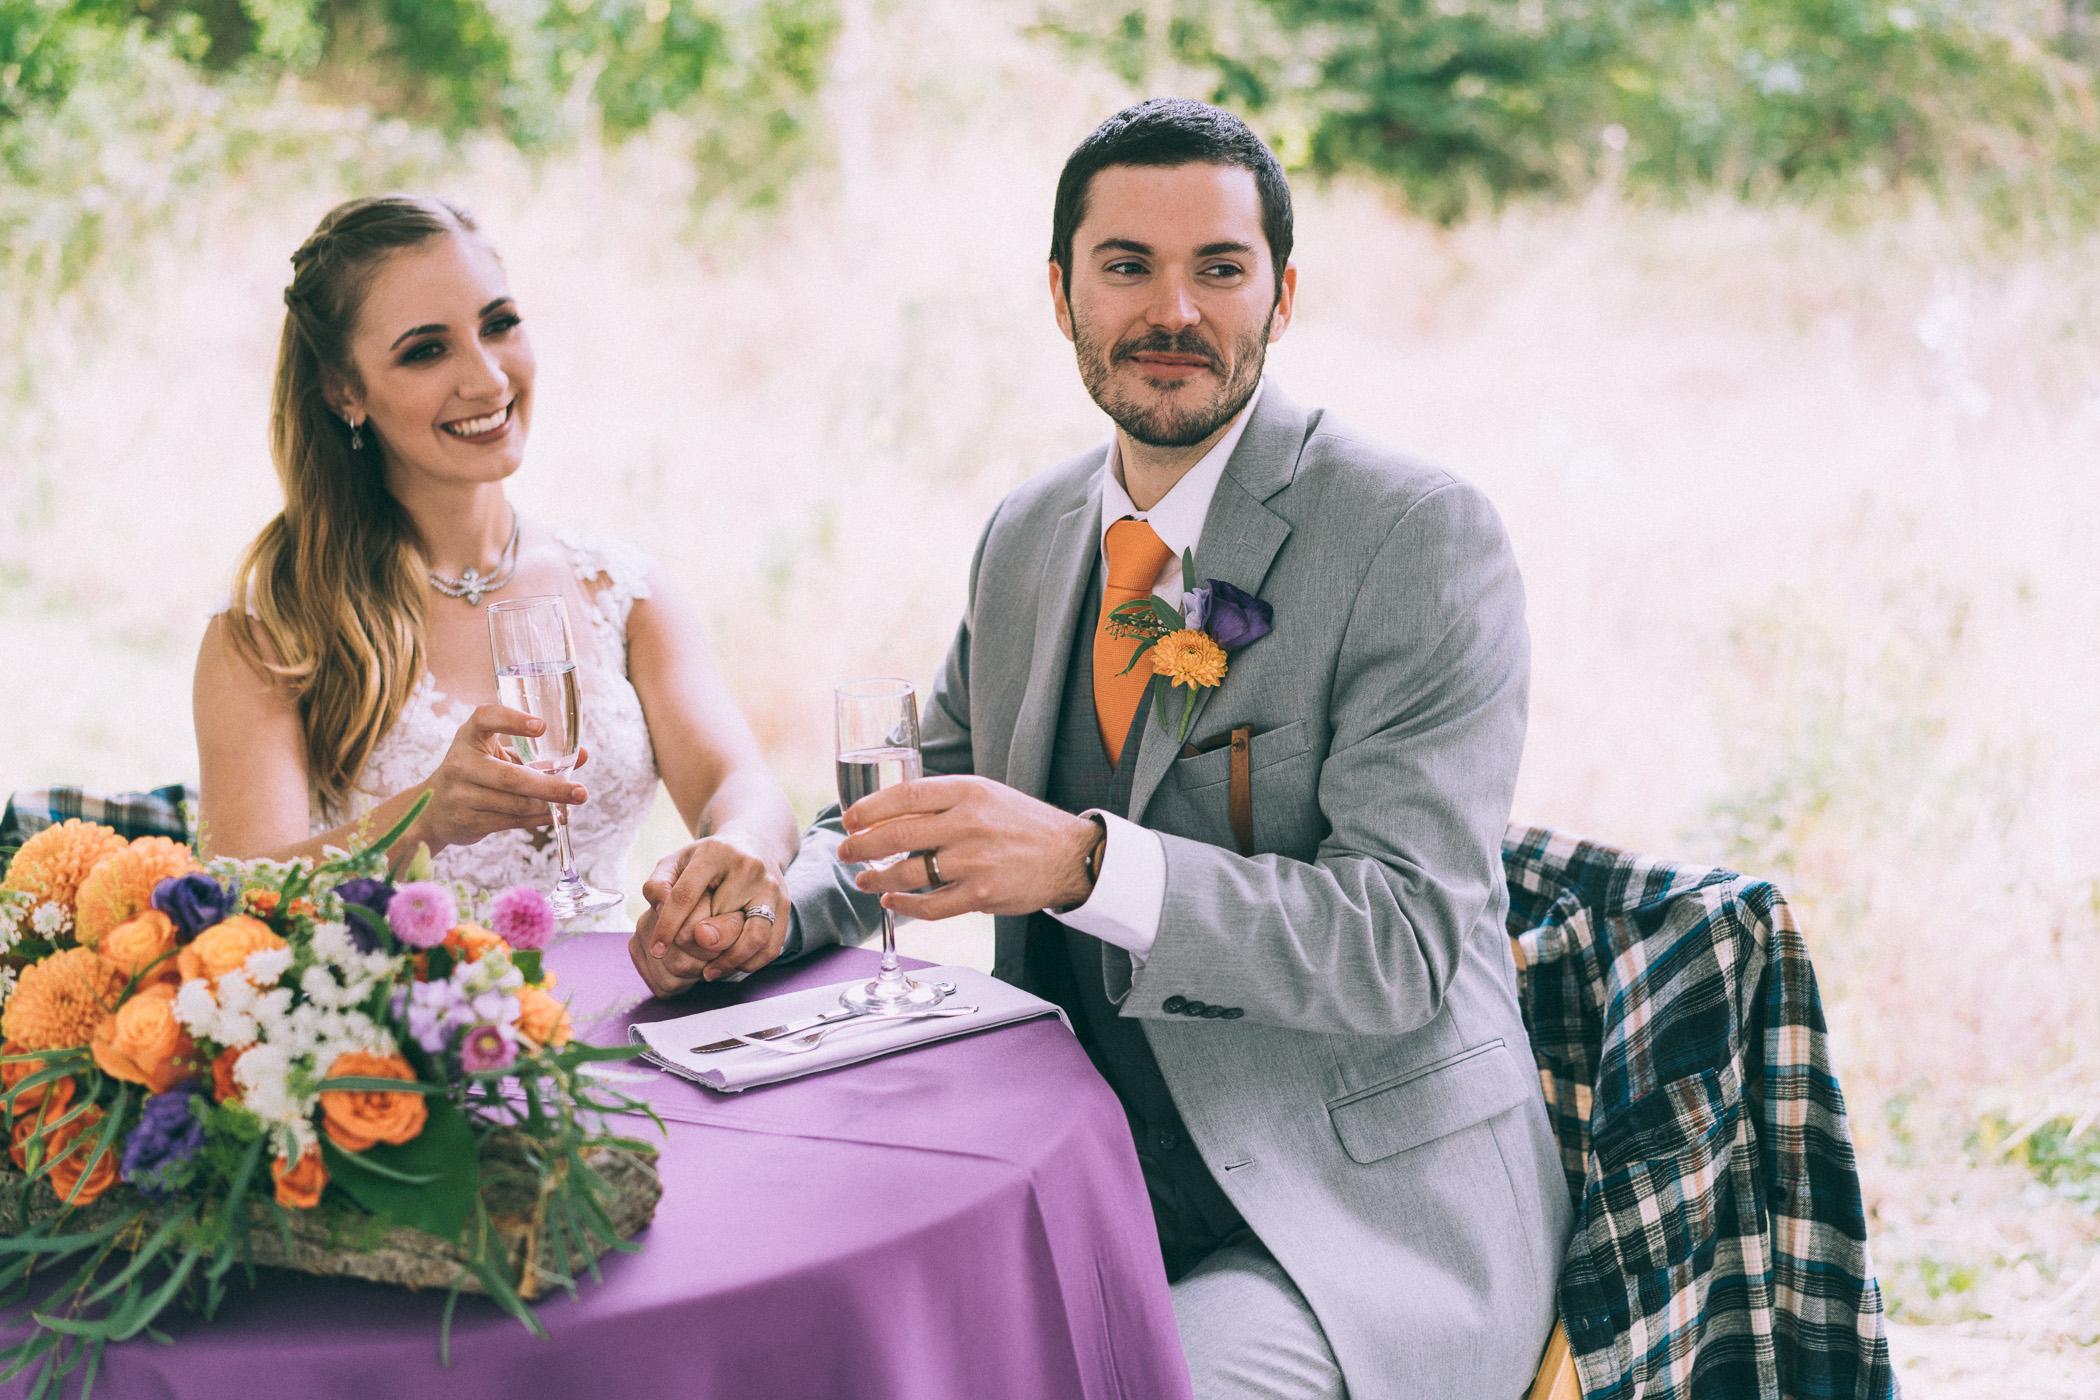 18-Faux Wedding-brandon shane warren-343.jpg